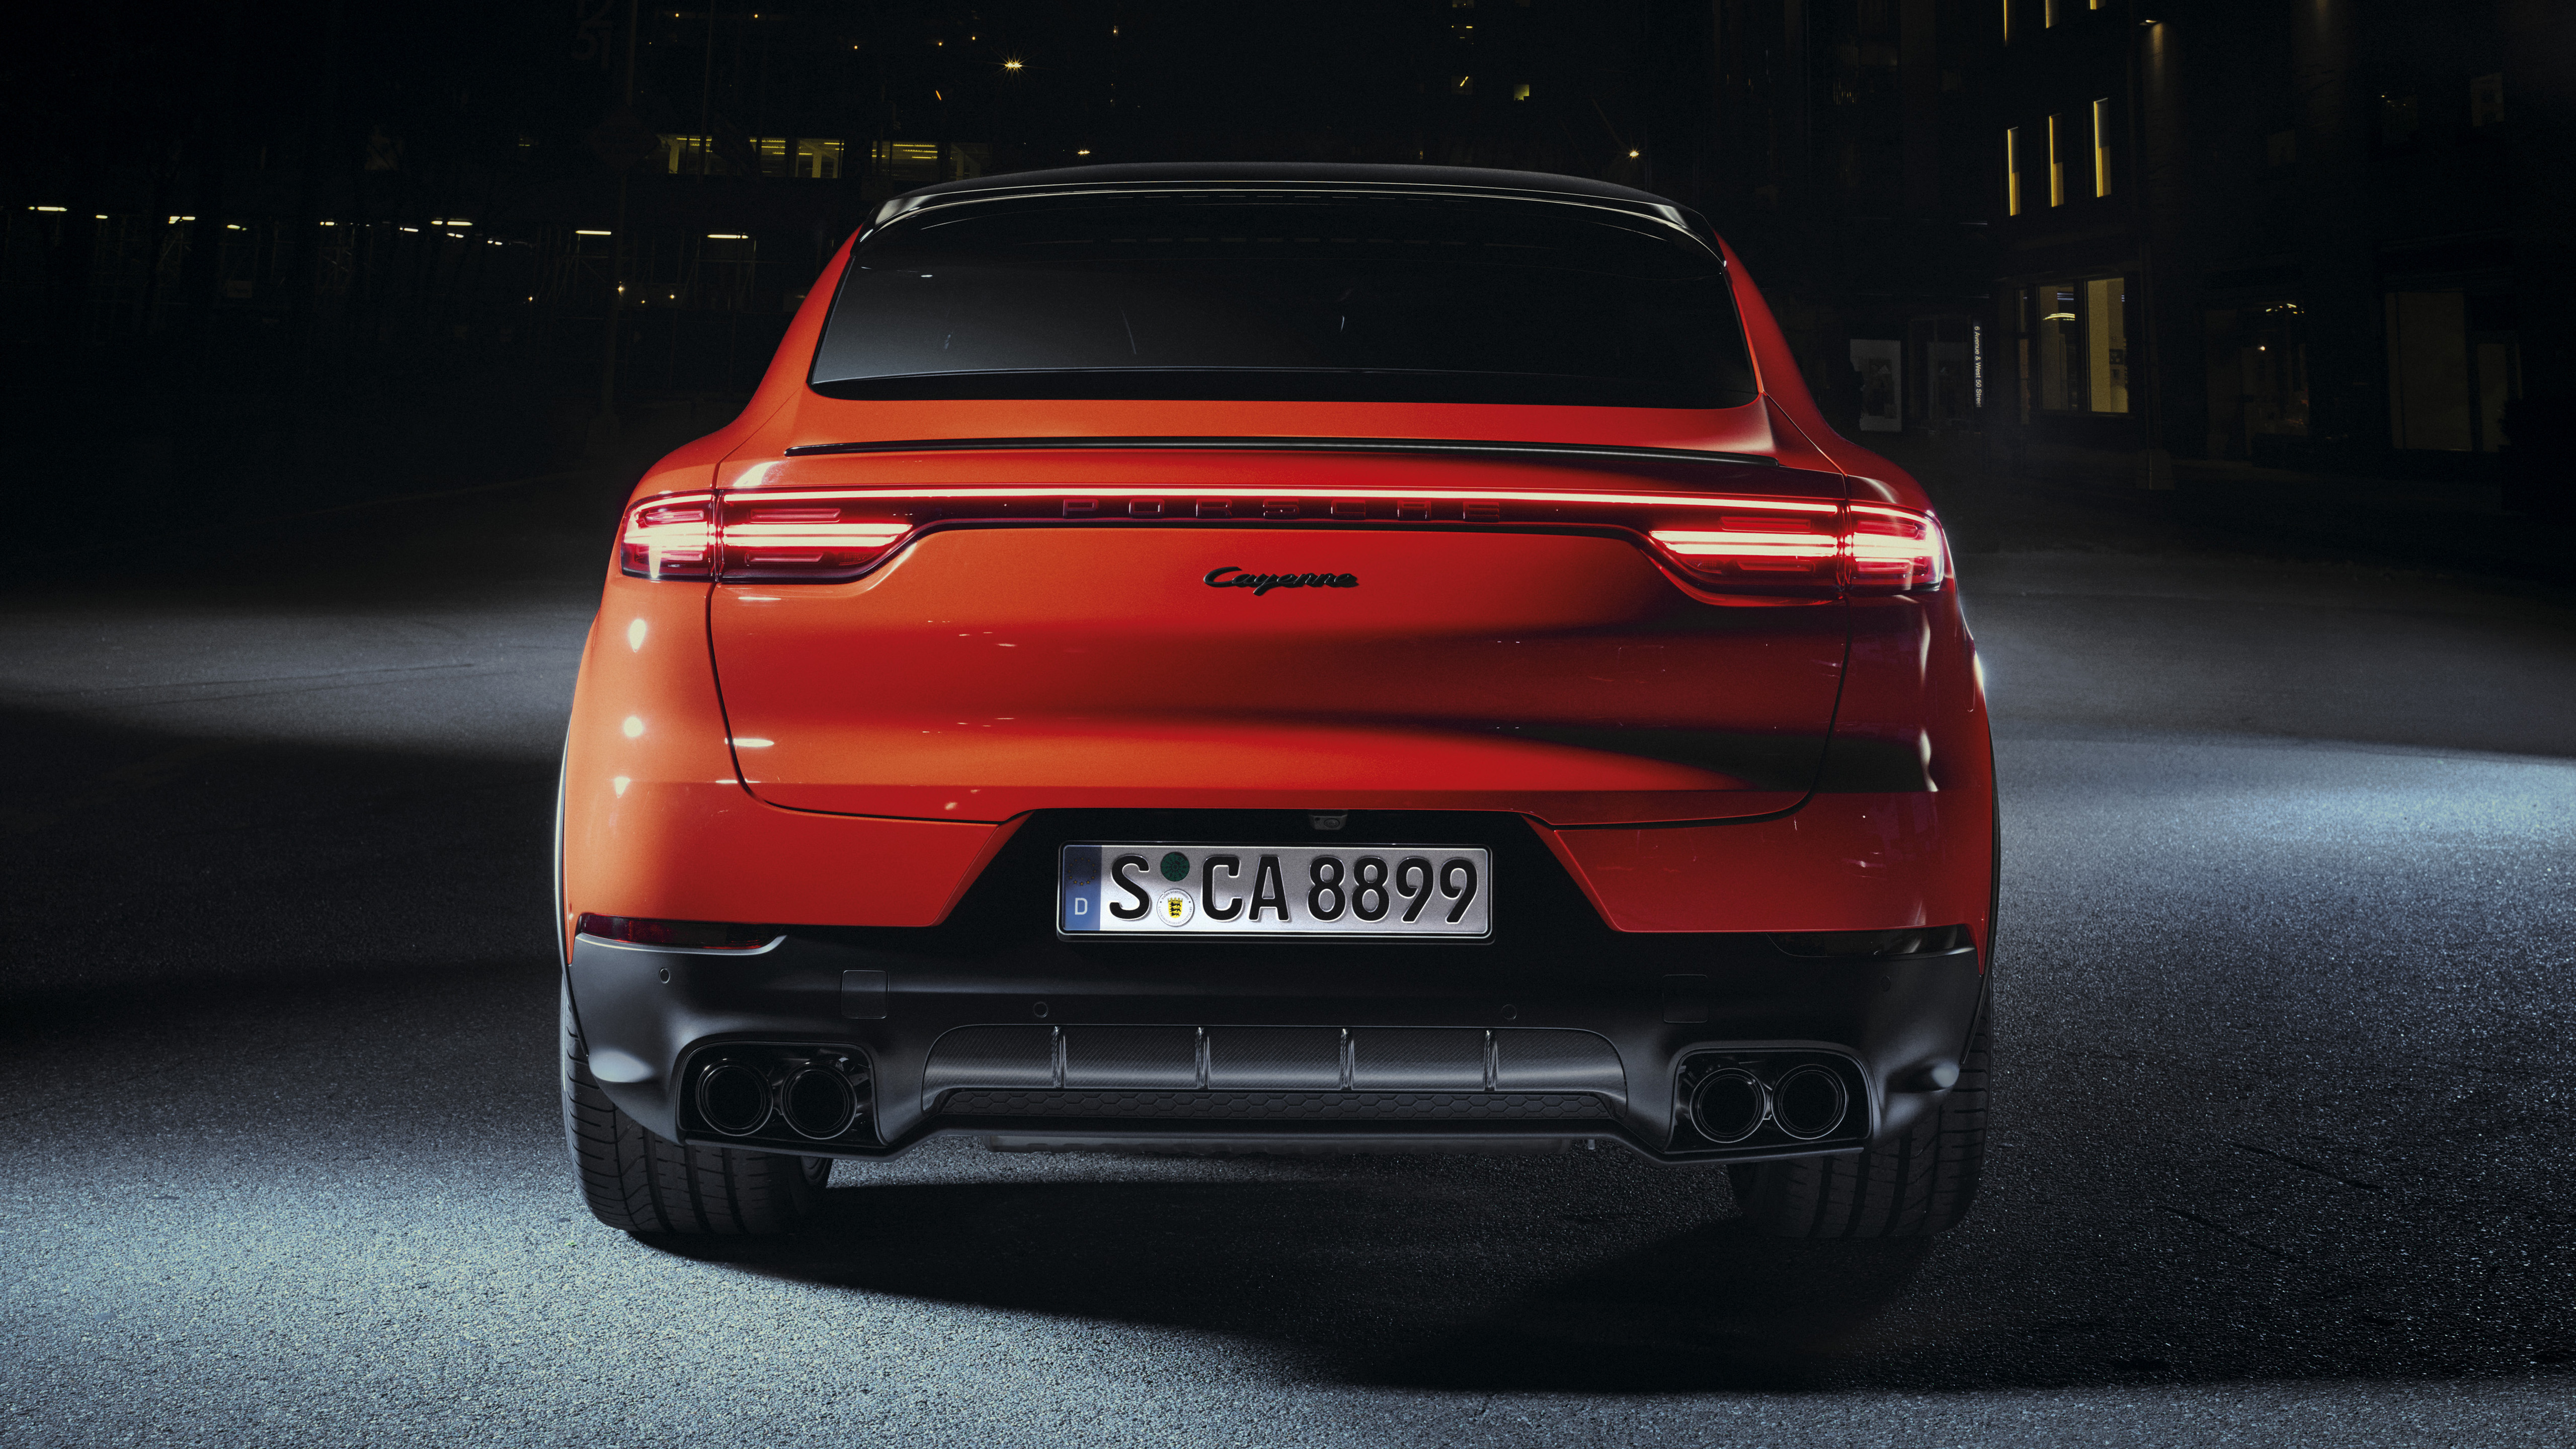 Porsche Cayenne Coupe 2019 4K 6 Wallpaper HD Car Wallpapers ID 5120x2880